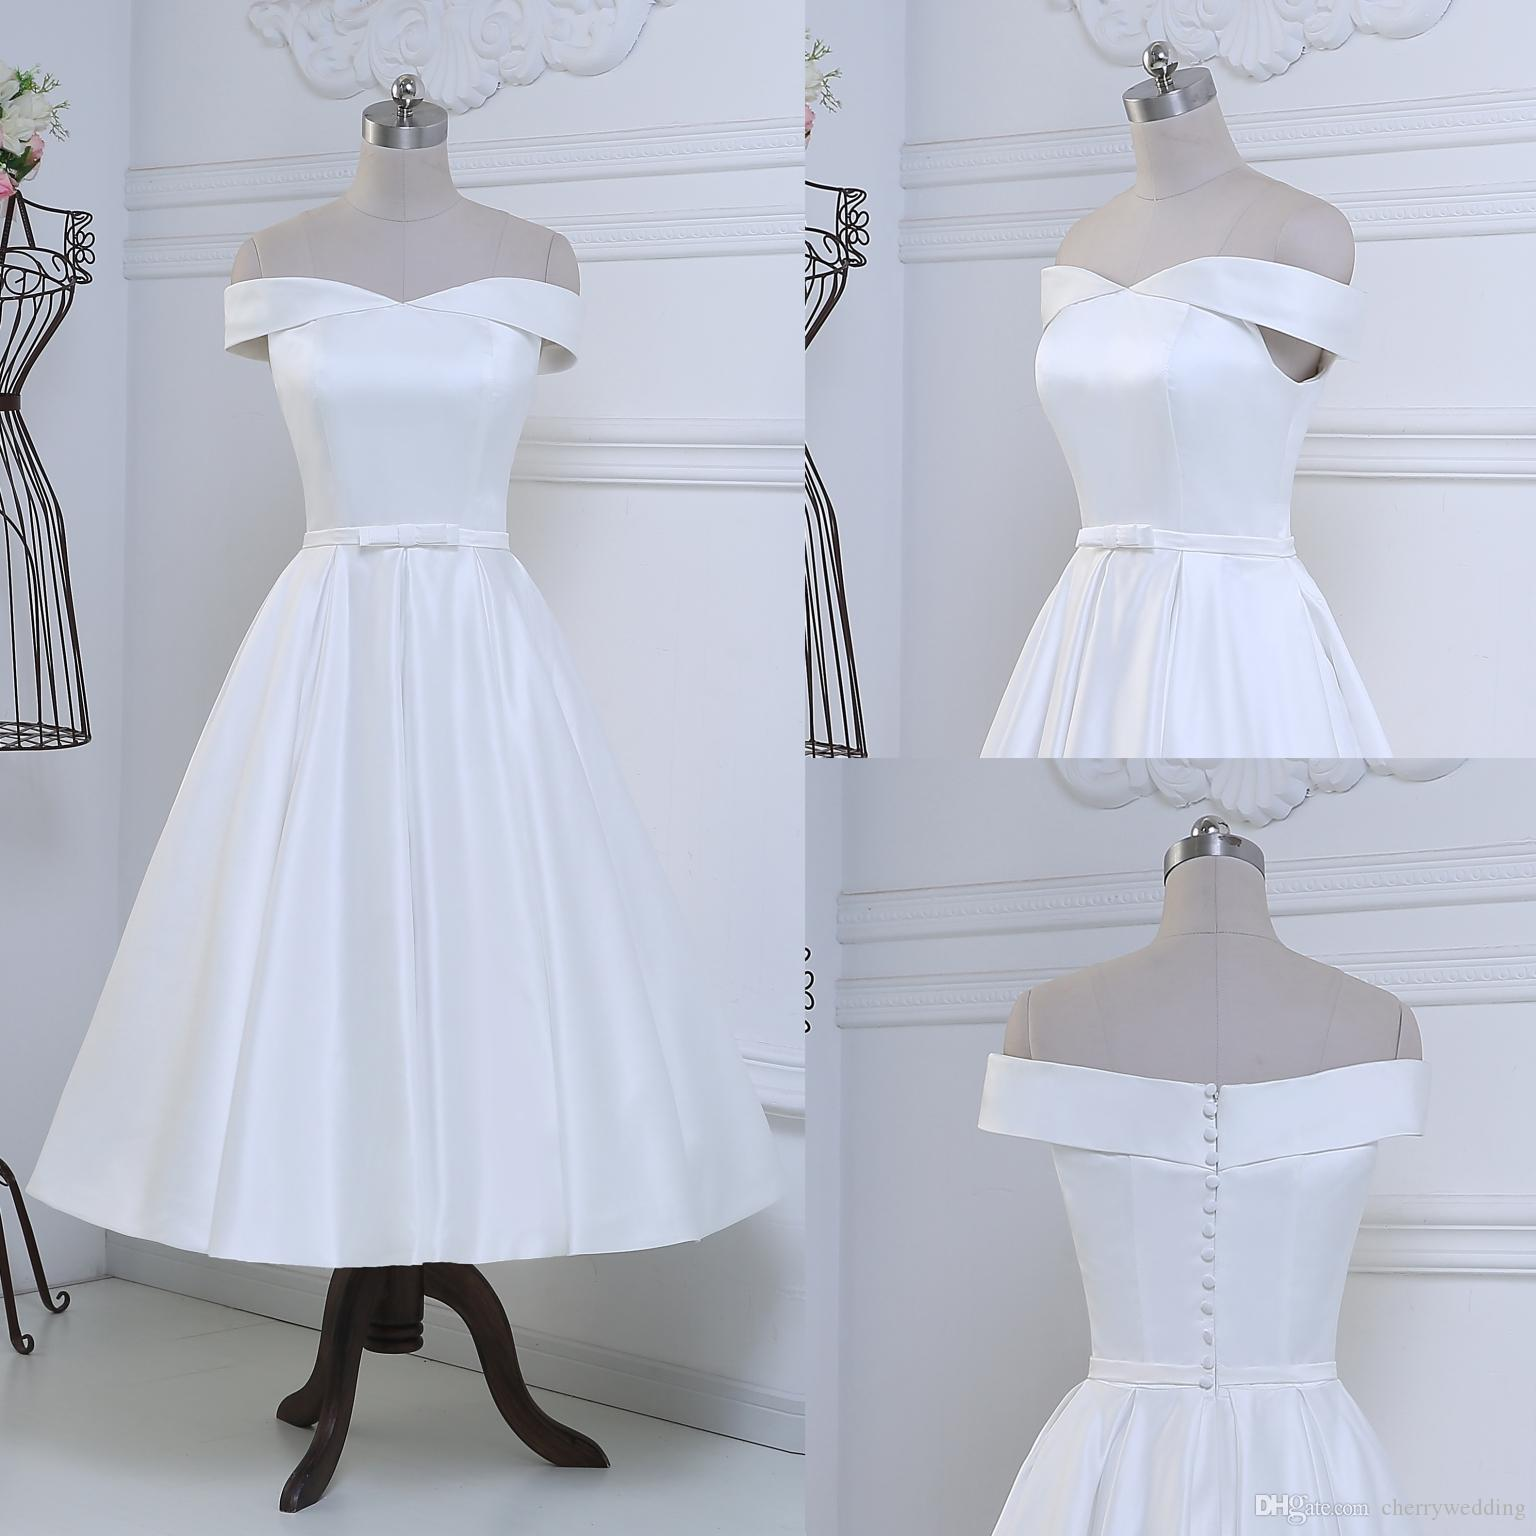 Discount Off The Shoulder Wedding Dress Short Bridal Satin Tea Length Gowns Fabric Button Vintage Inspired Gown Rll028: Short Vintage Inspired Wedding Dresses At Reisefeber.org